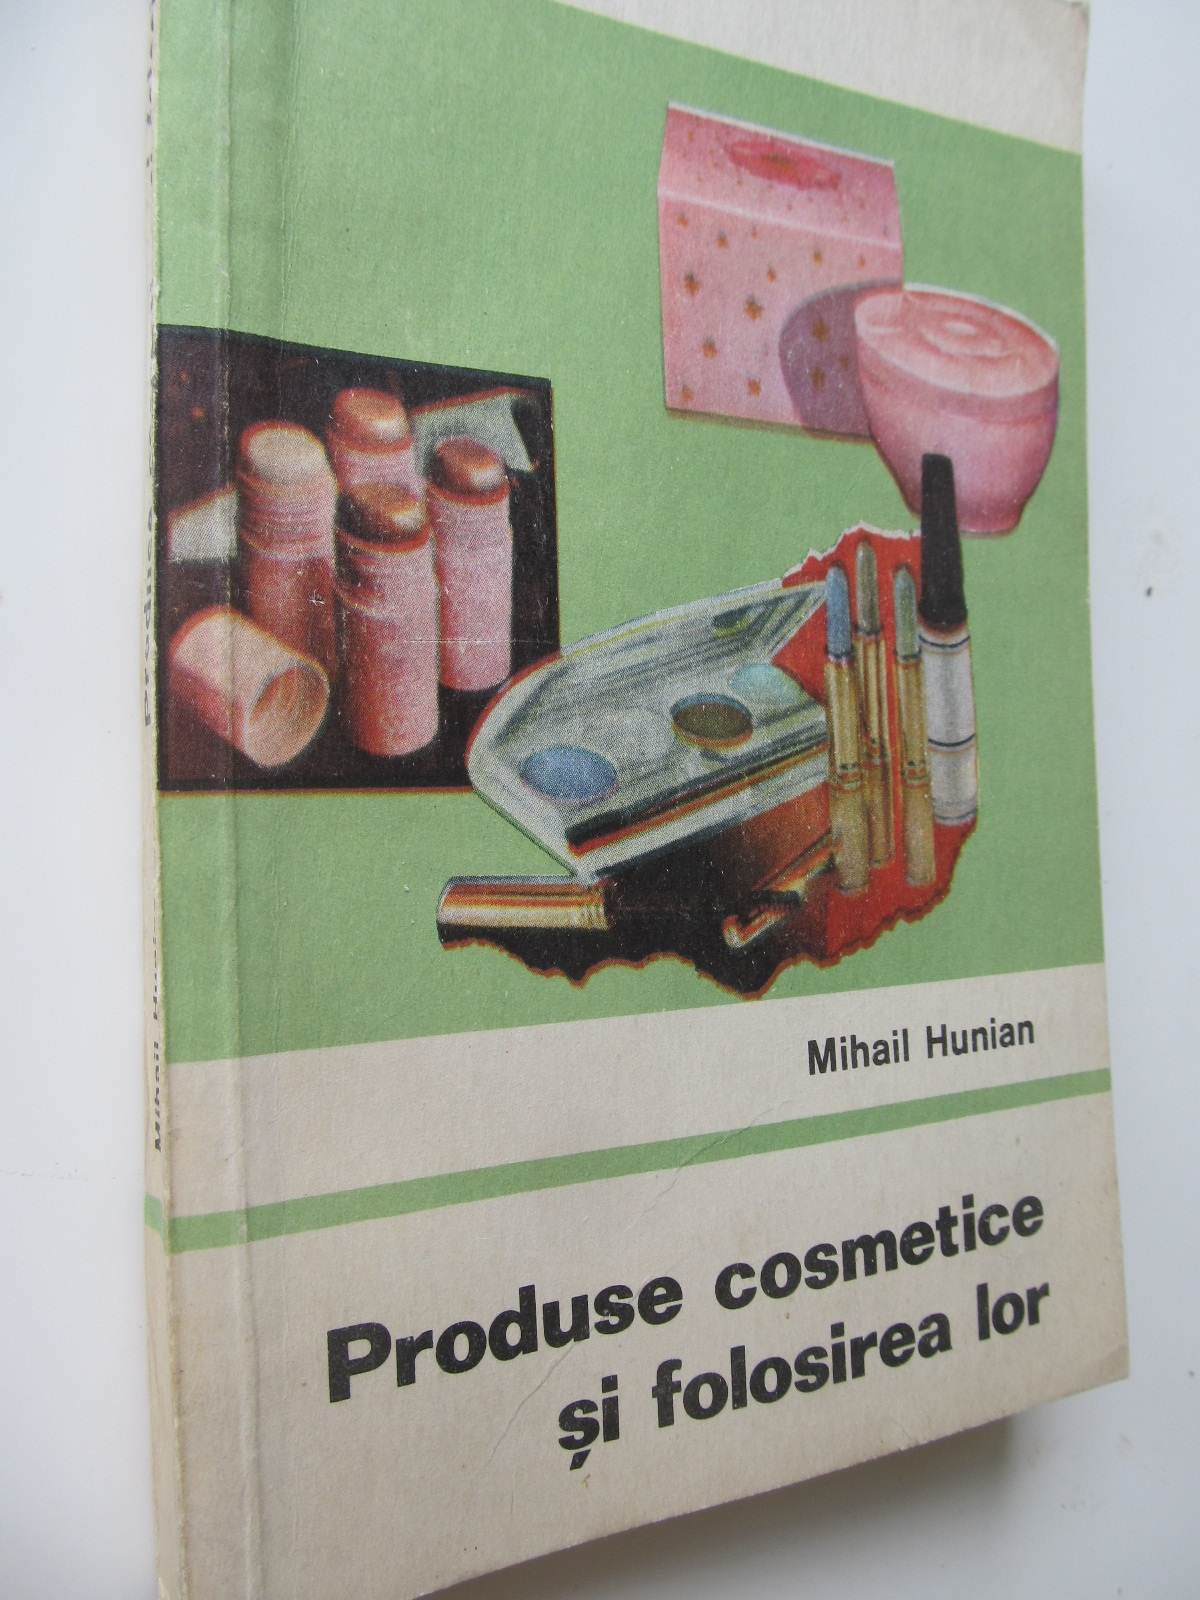 Produse cosmetice si folosirea lor - Mihail Hunian | Detalii carte